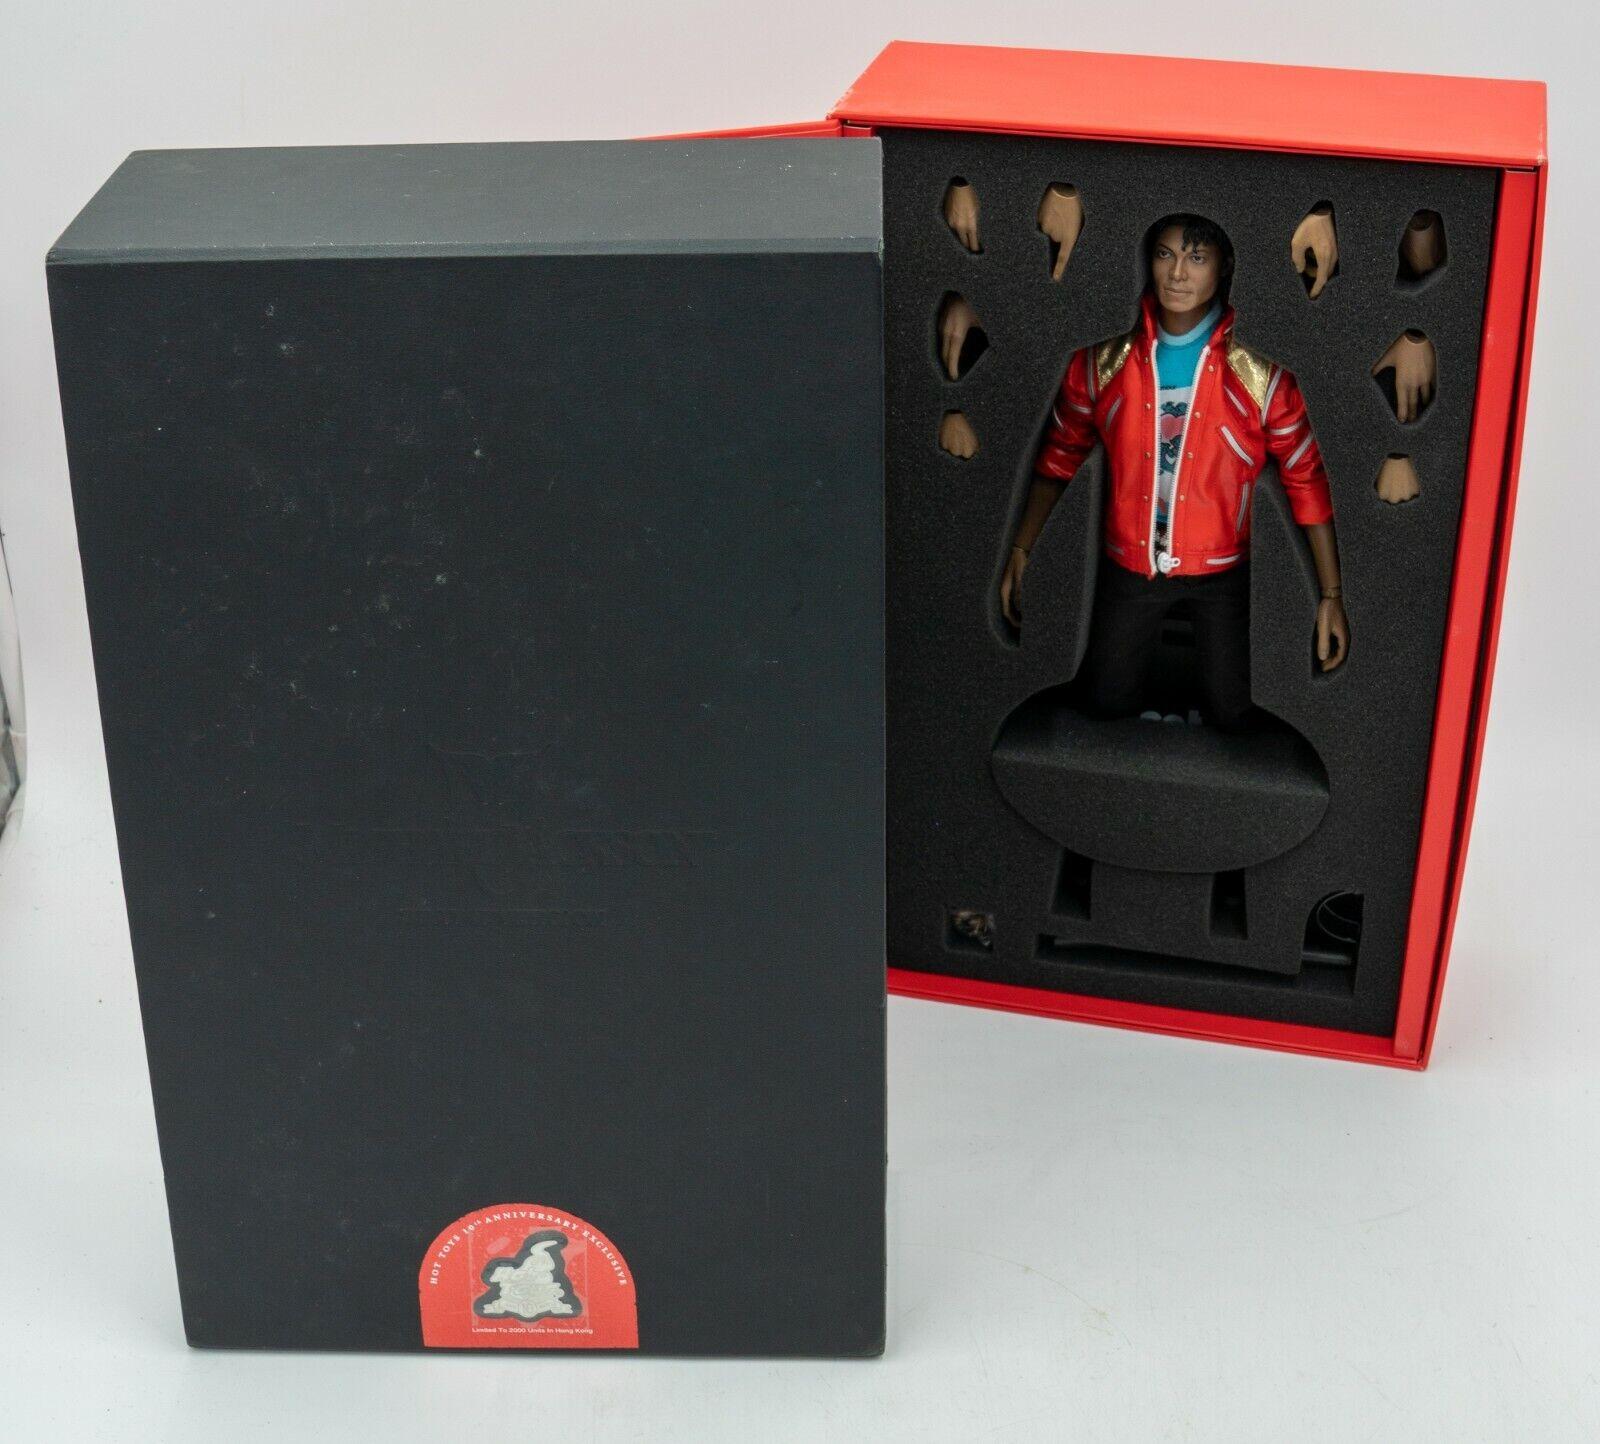 Michael Jackson Hot Toys 1/6 Scale Beat it Version Action Figure on eBay thumbnail